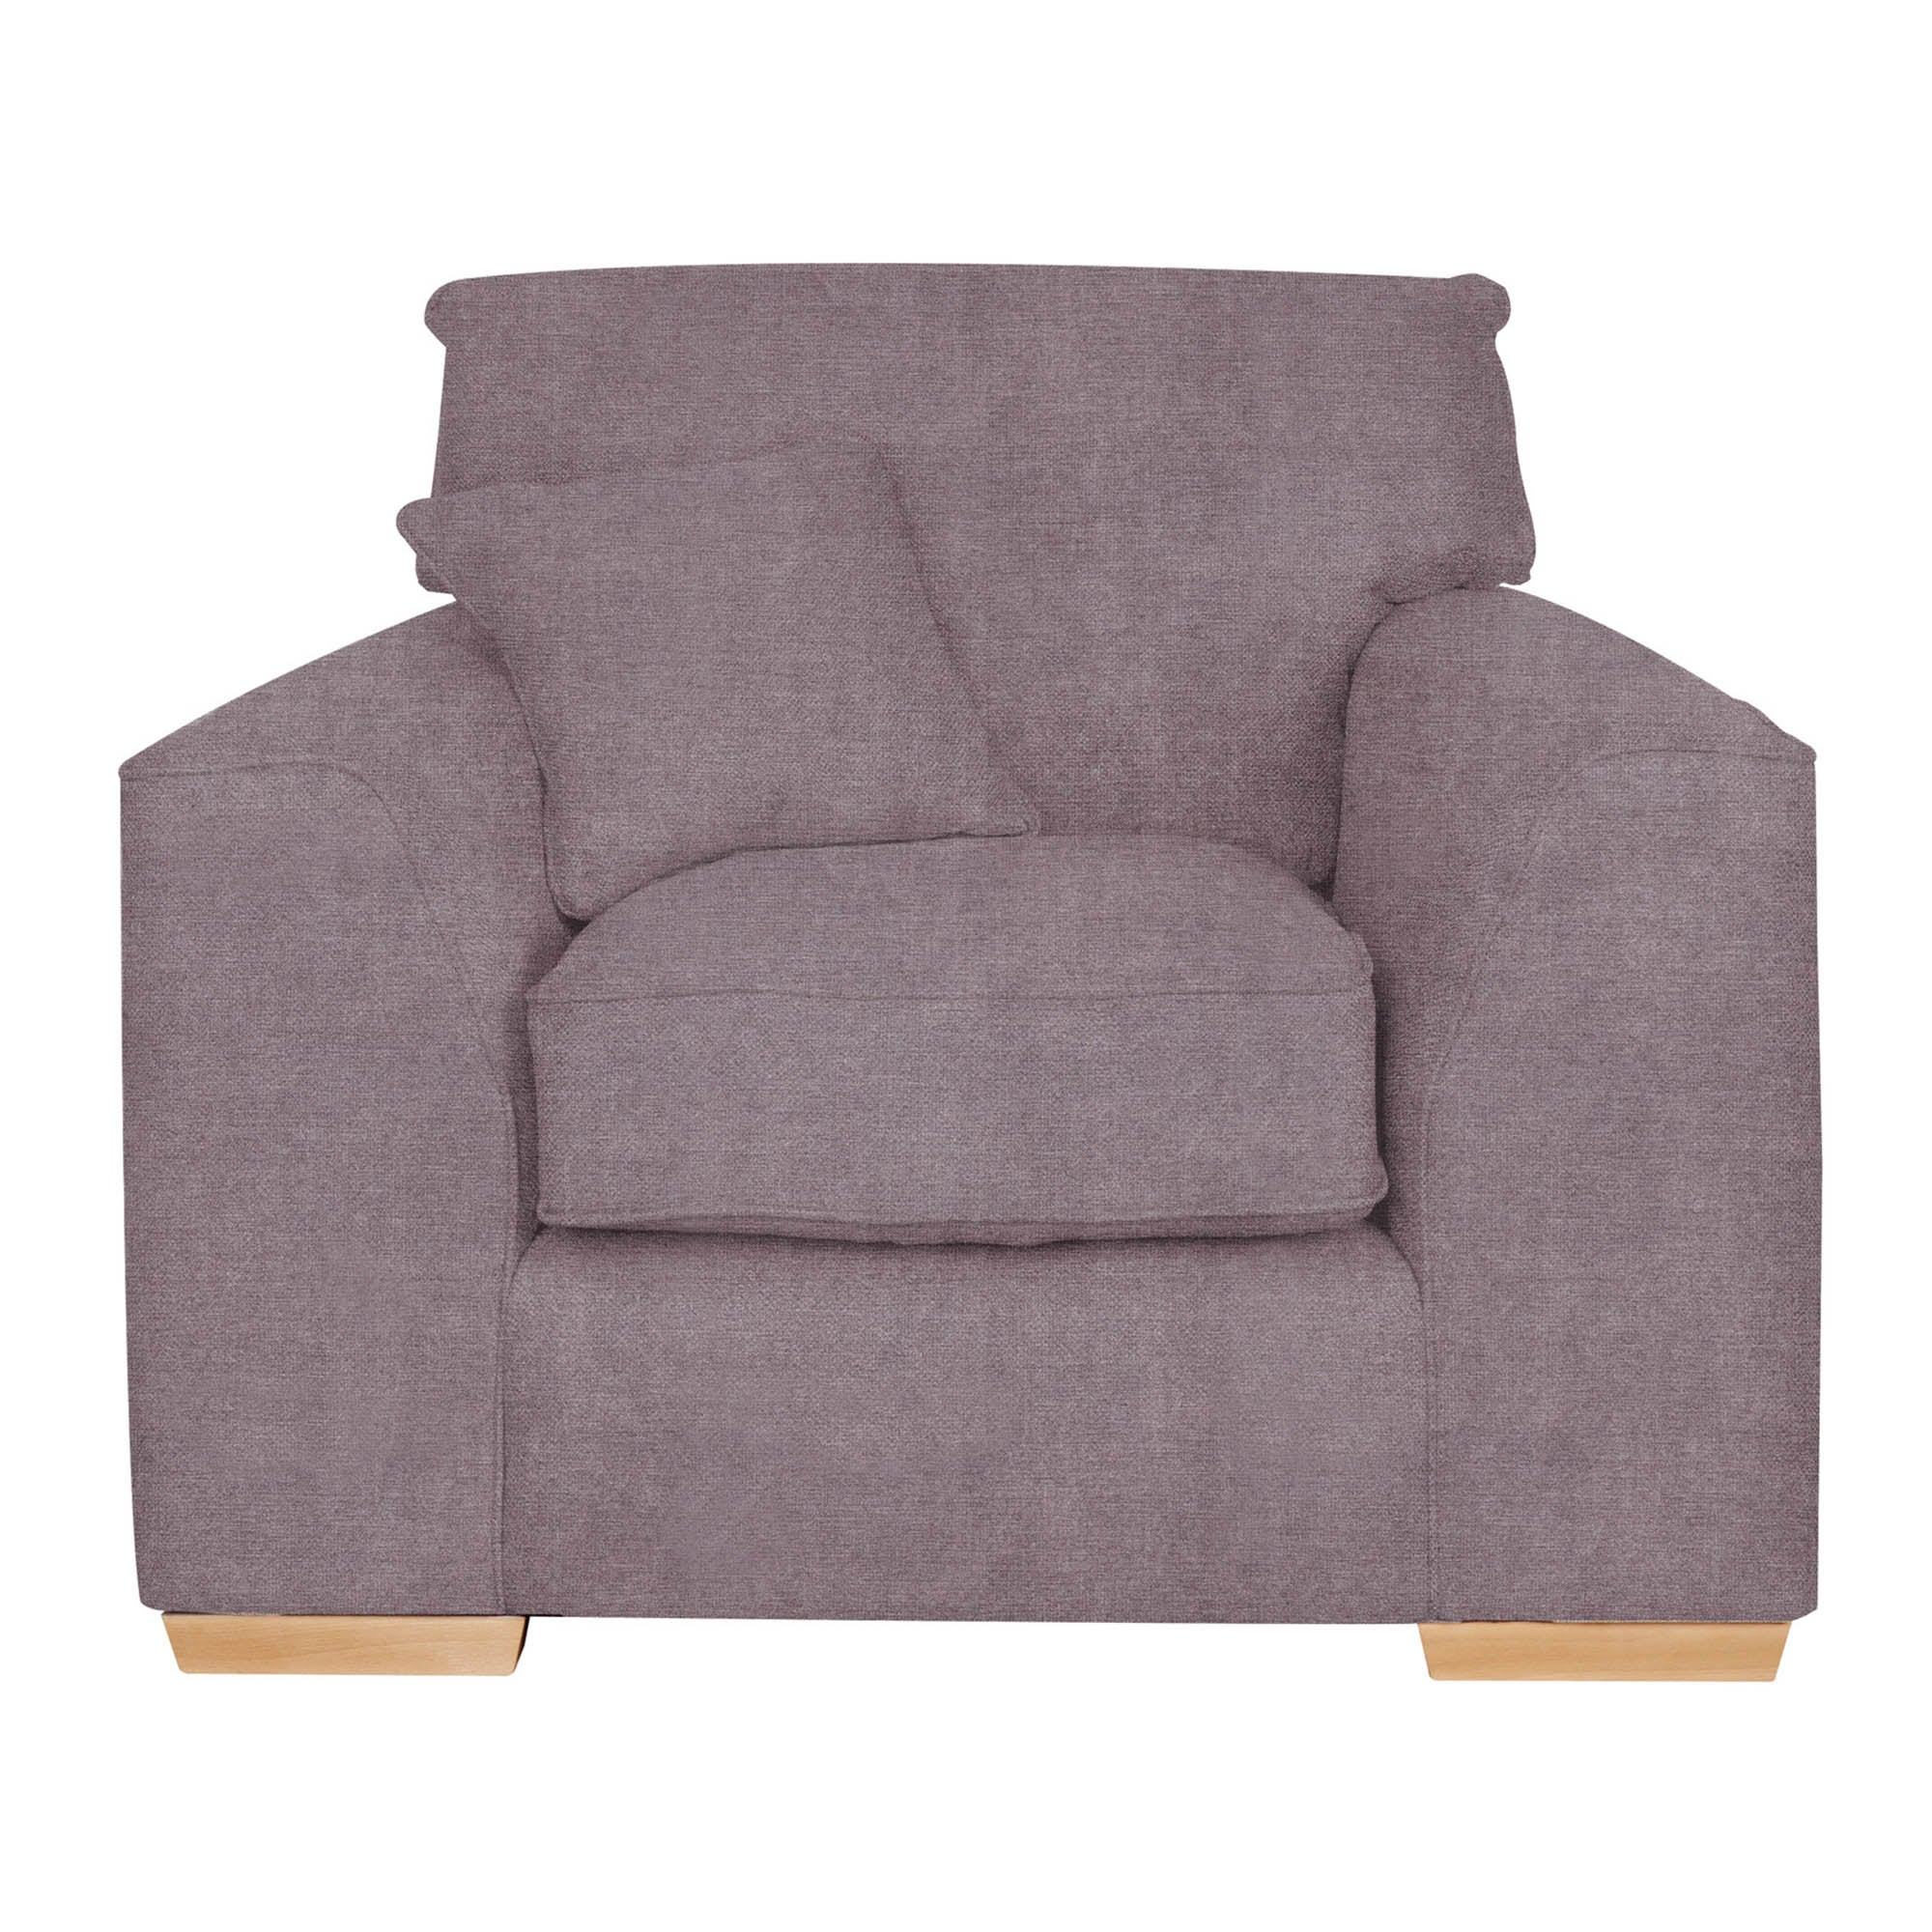 Hove Armchair